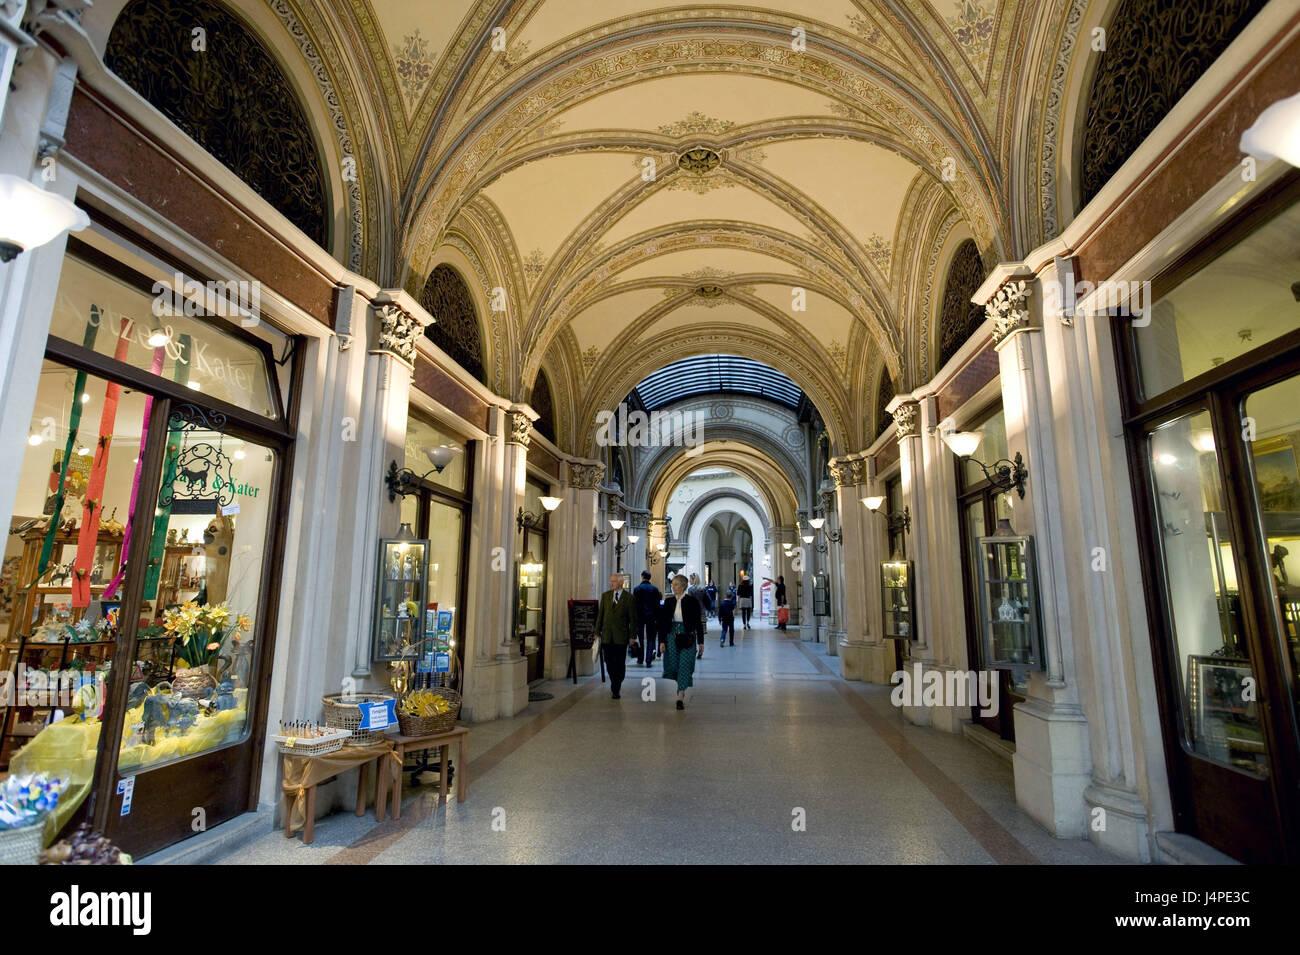 Austria, Vienna, palace of Ferstel, Freyung, - Stock Image